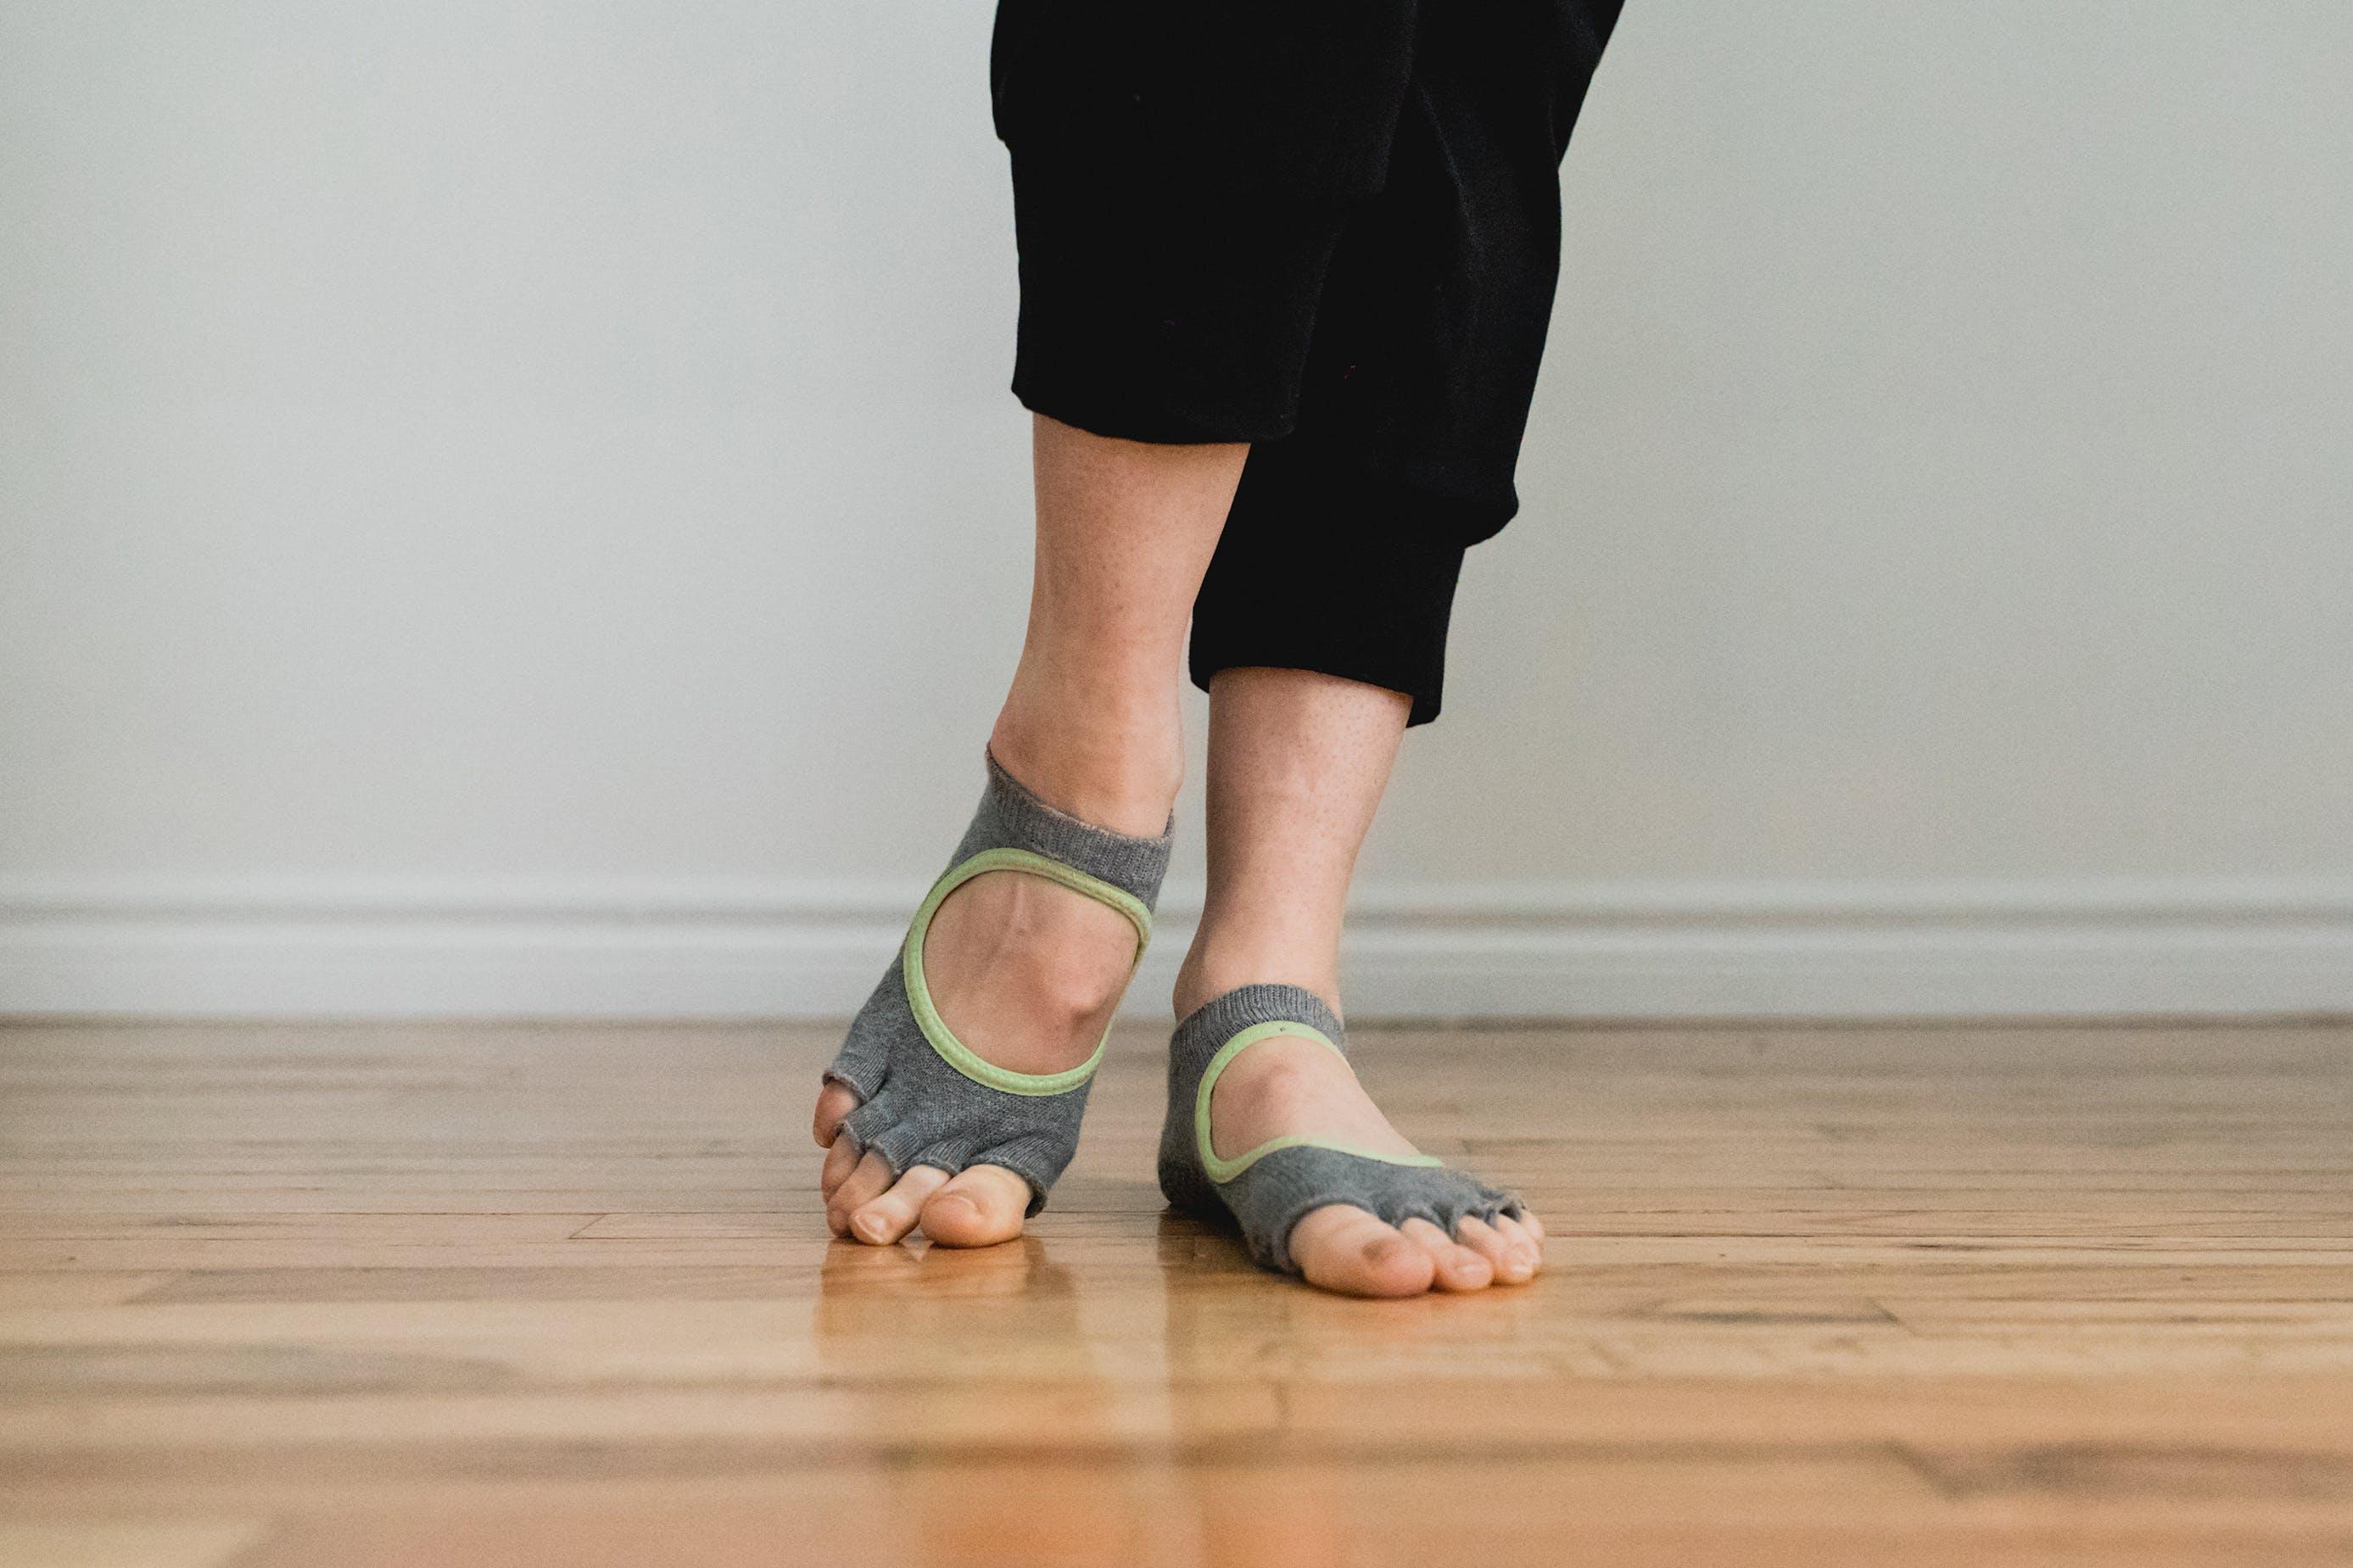 Bella Half Toe Grip Socks give the feeling of being barefoot